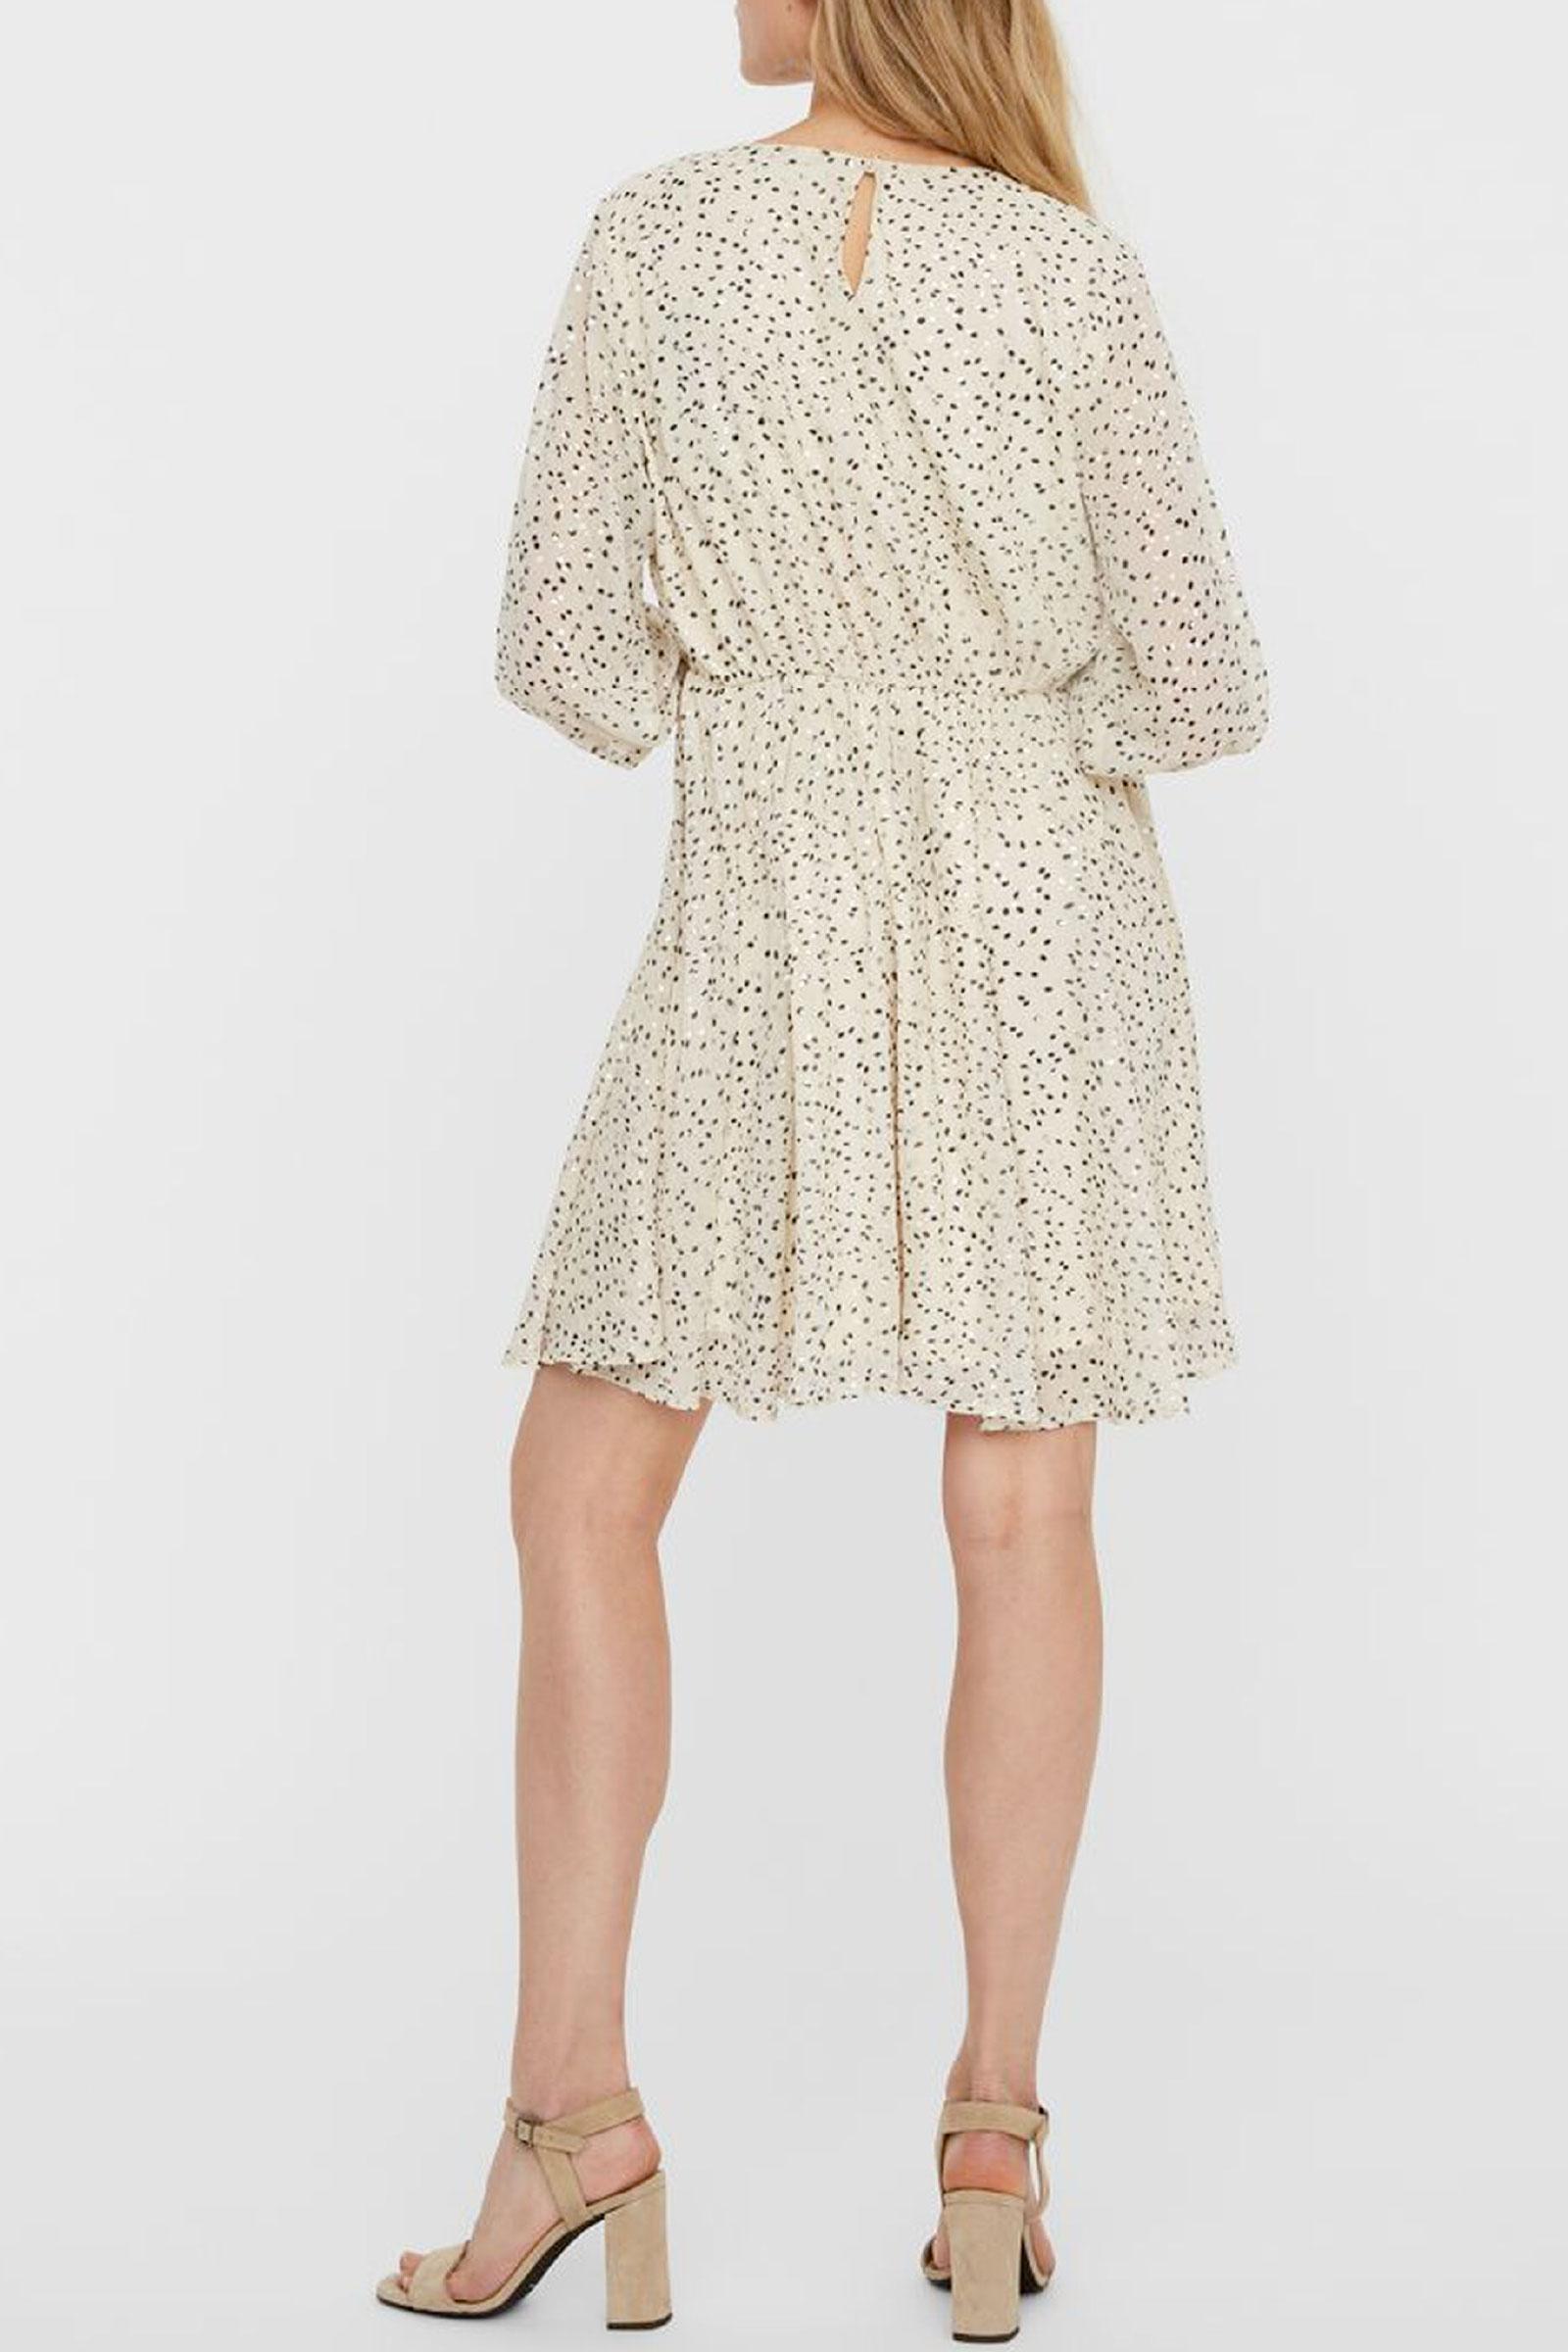 VERO MODA   Dress   10245699Detail-NAVY AND SILVER